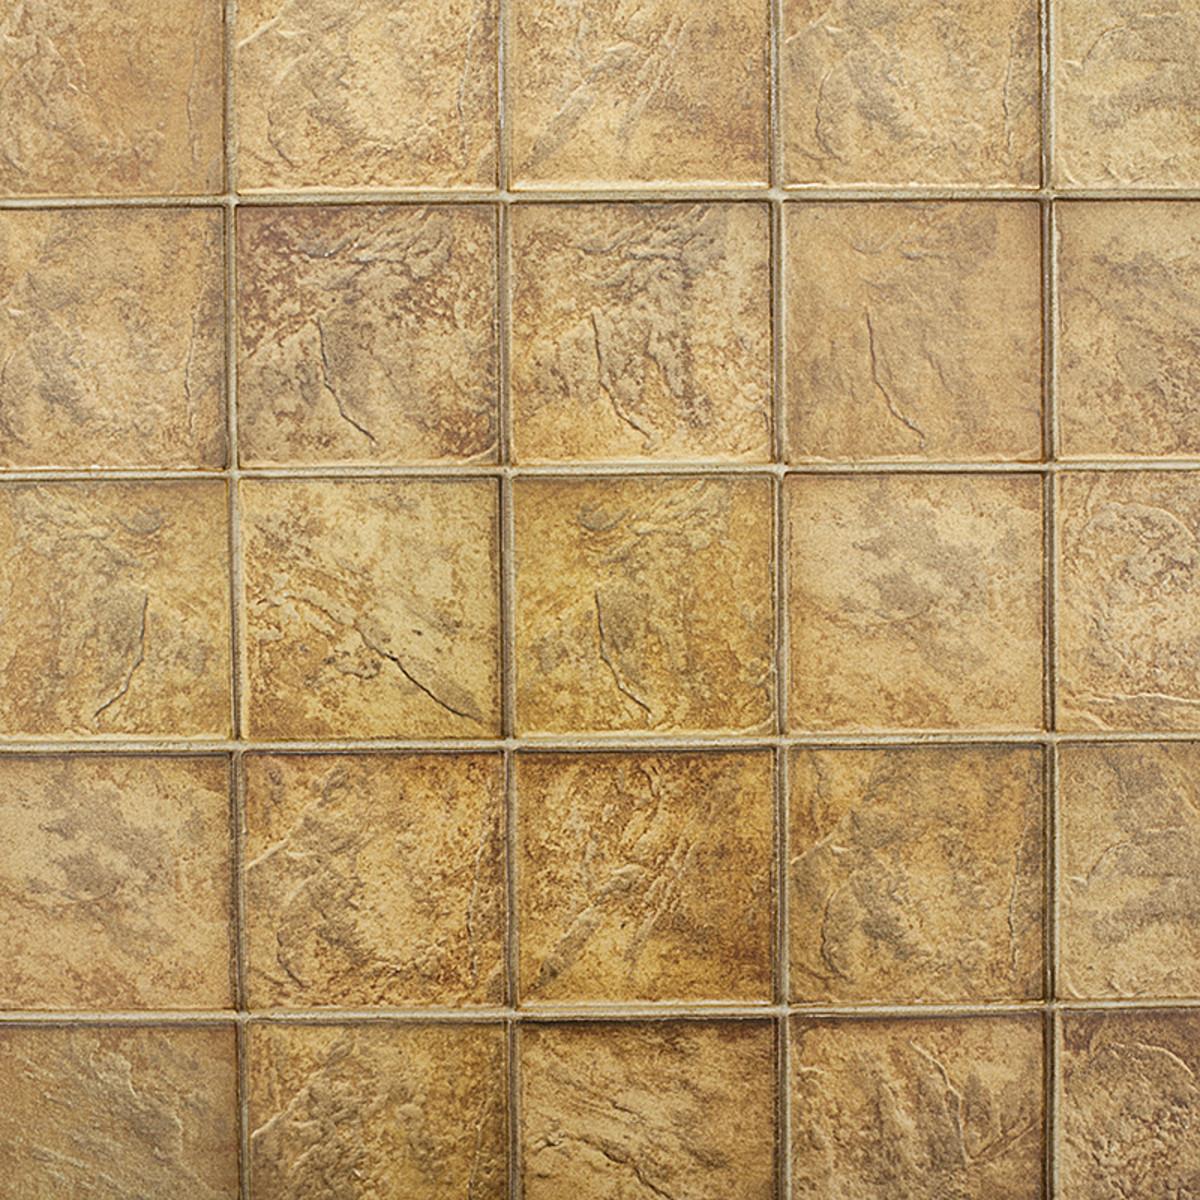 Панель ПВХ Плитка 964х484х3 мм цвет коричневый 0.47 м2